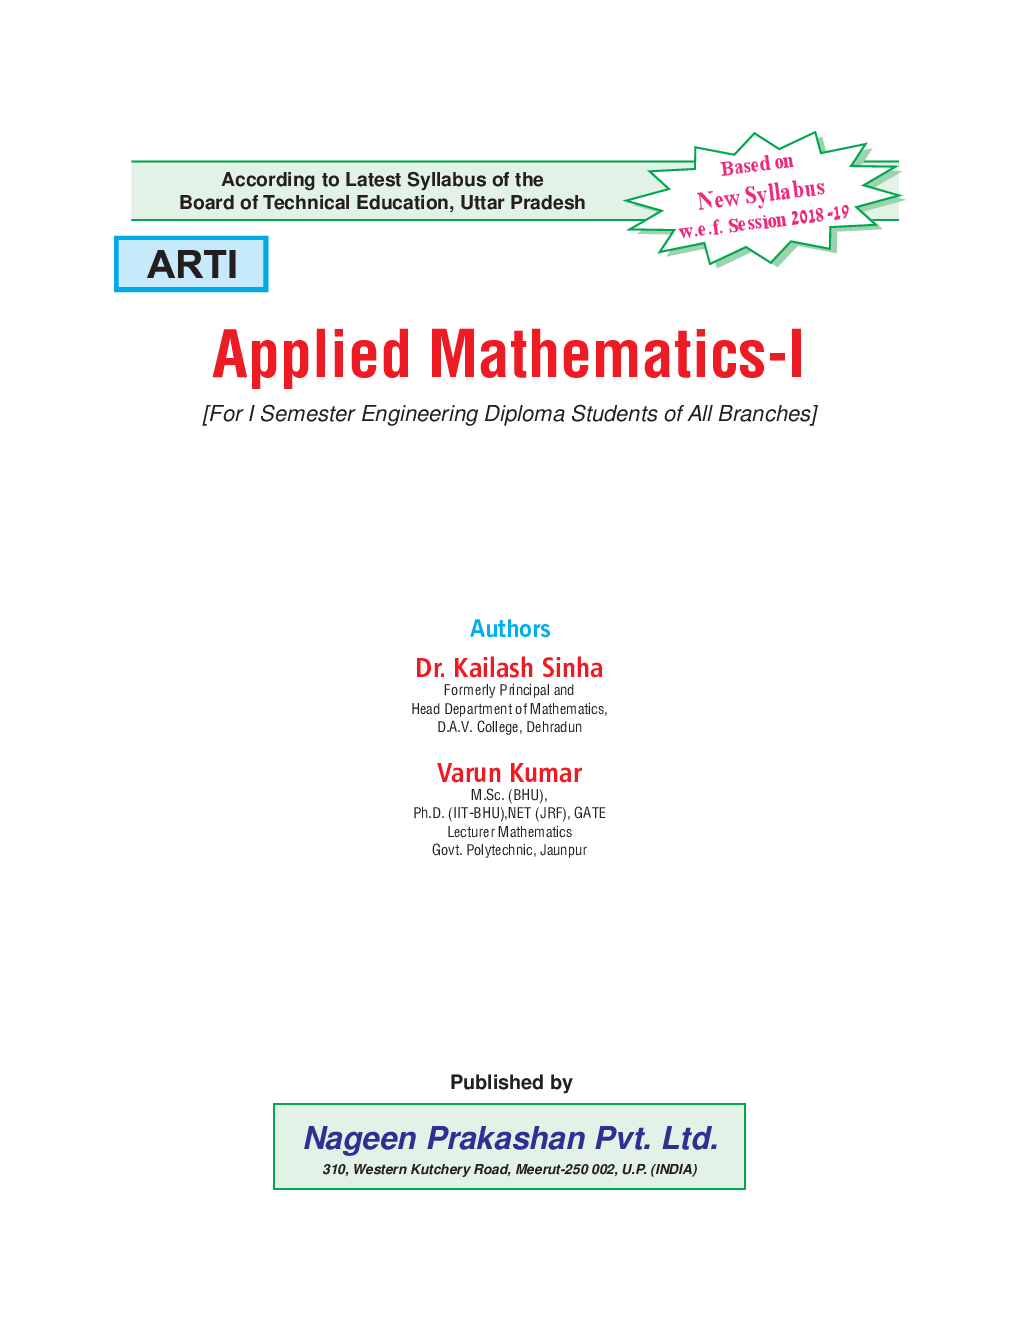 Applied Mathematics-I - Page 2